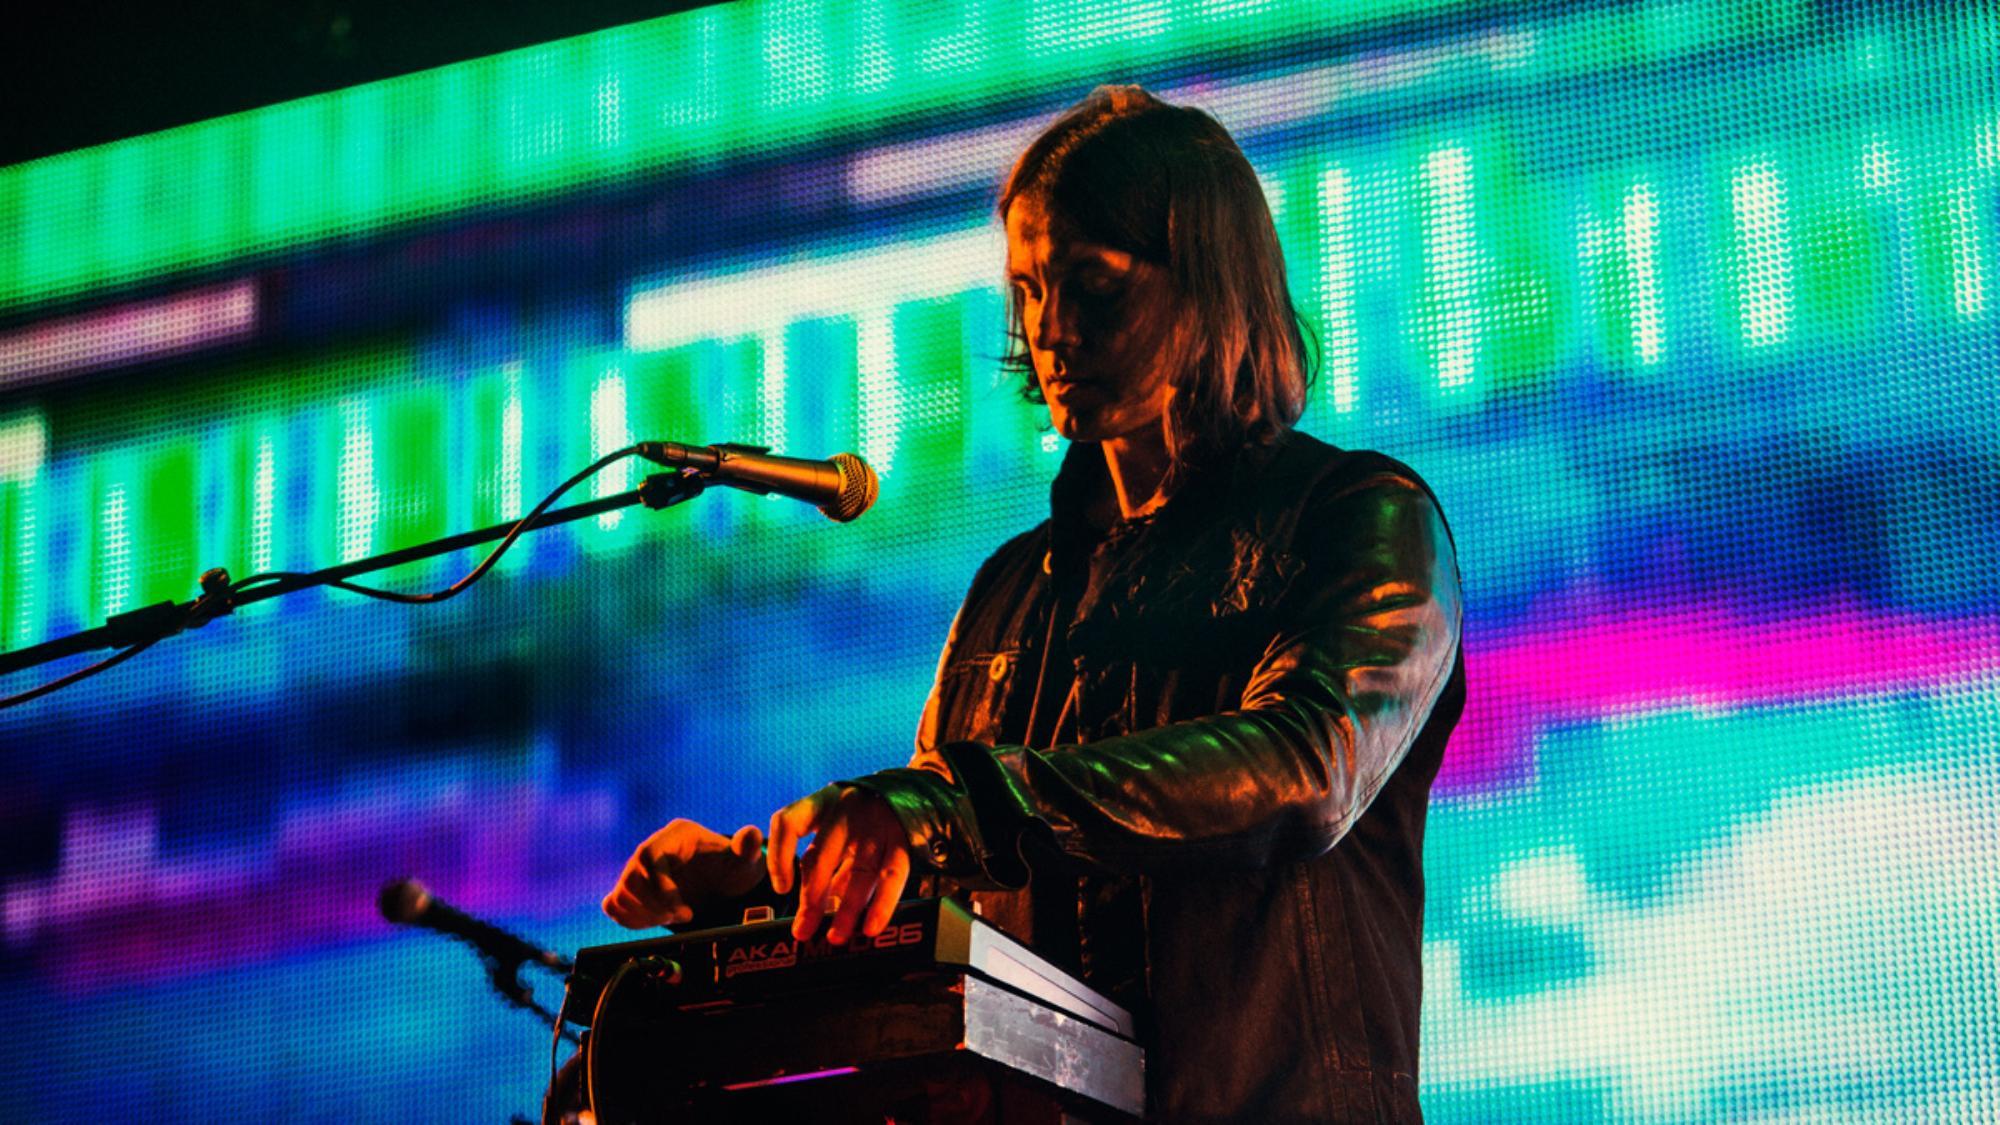 Alessandro Cortini (Nine Inch Nails) presenta 'Avanti' en Madrid 9f1fd2cb ac7b 497c 9ff0 20449b711f1b